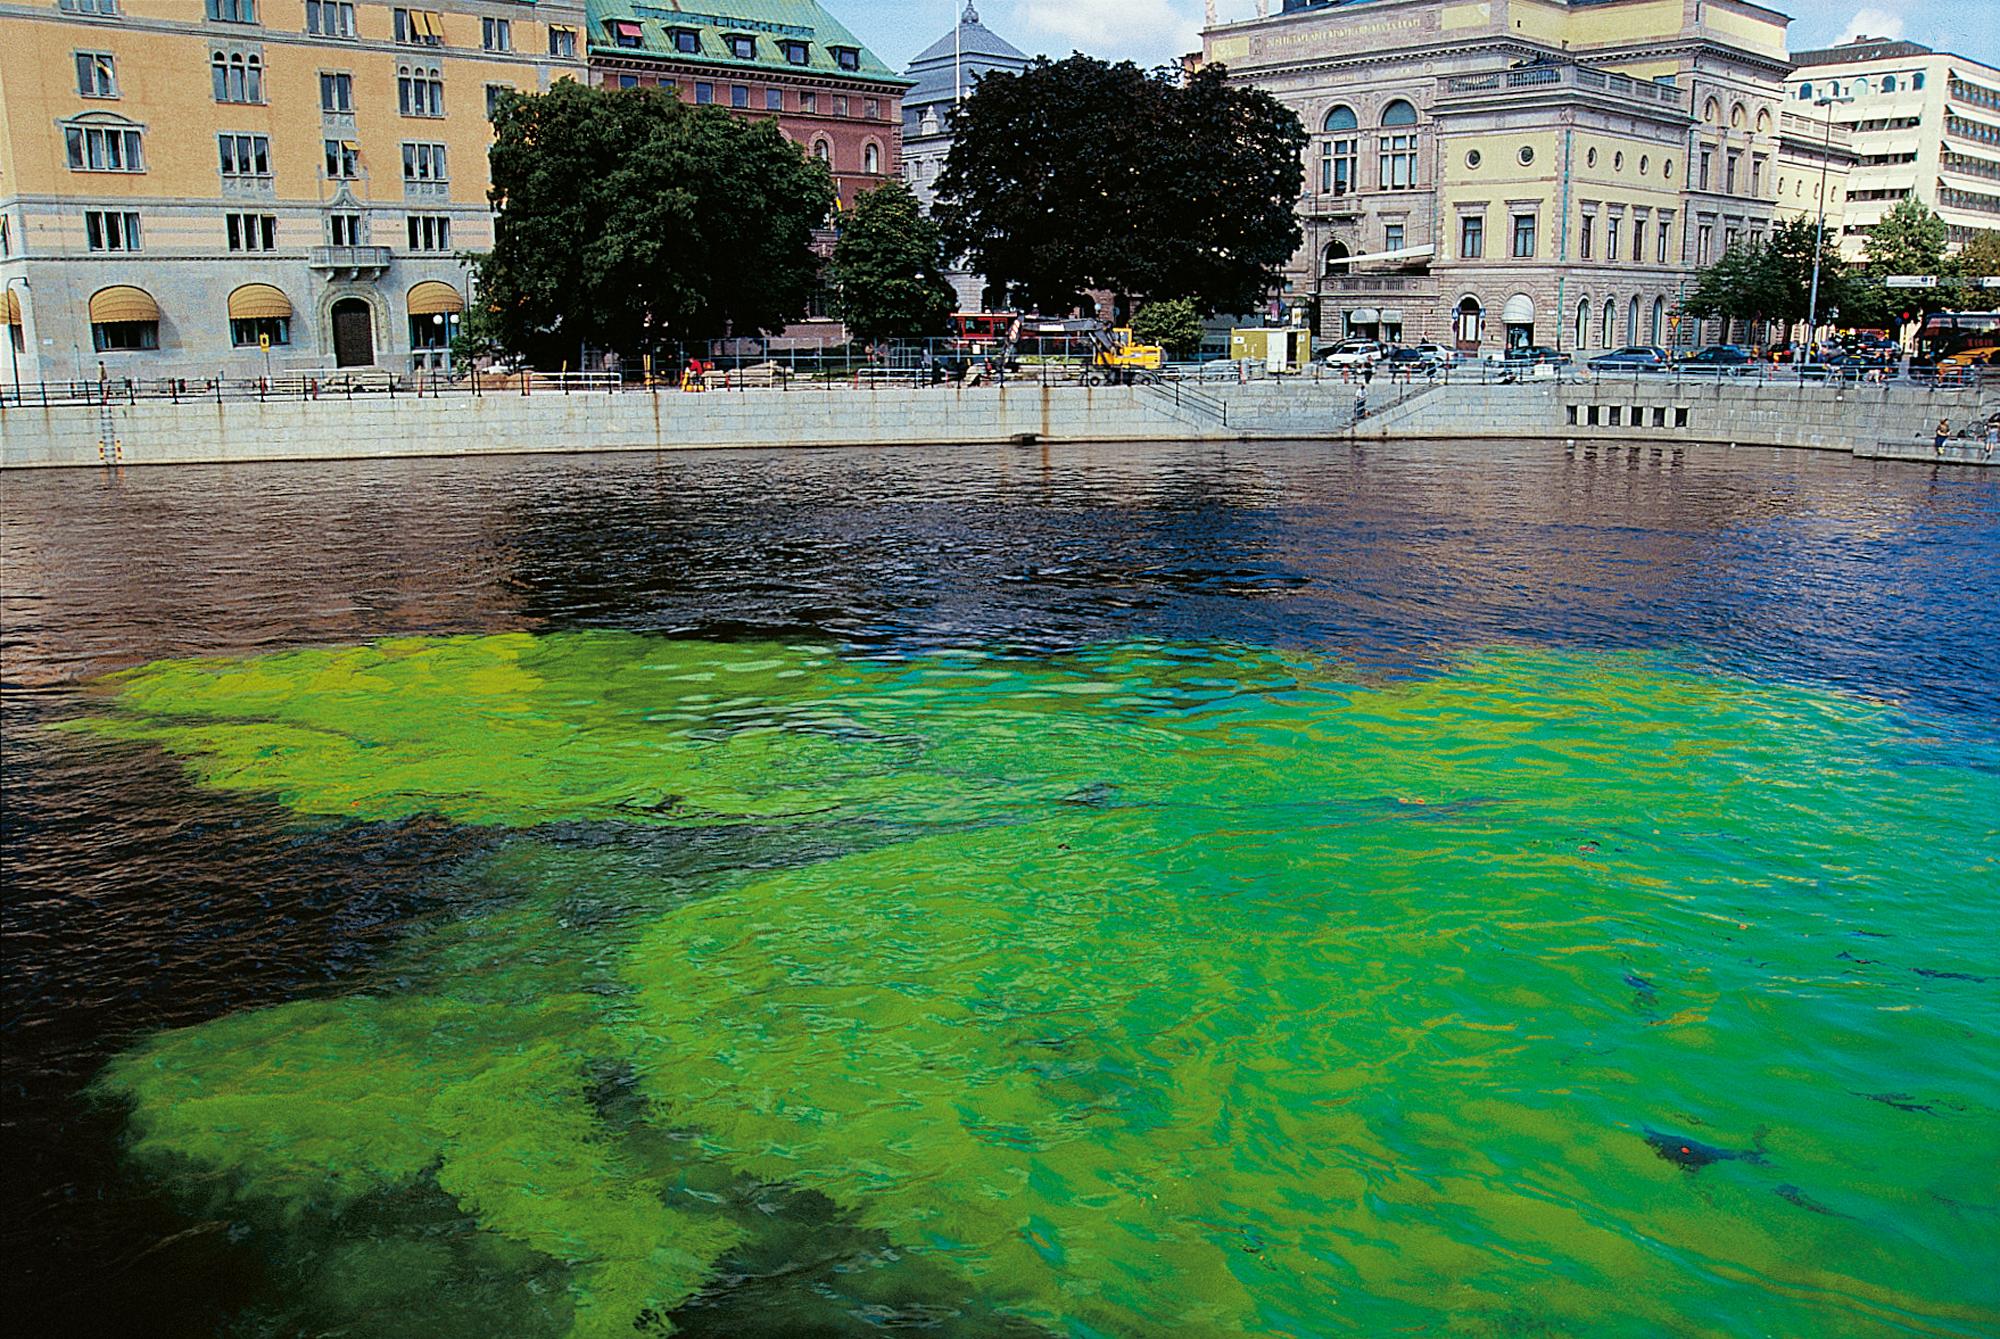 Green_river_101967